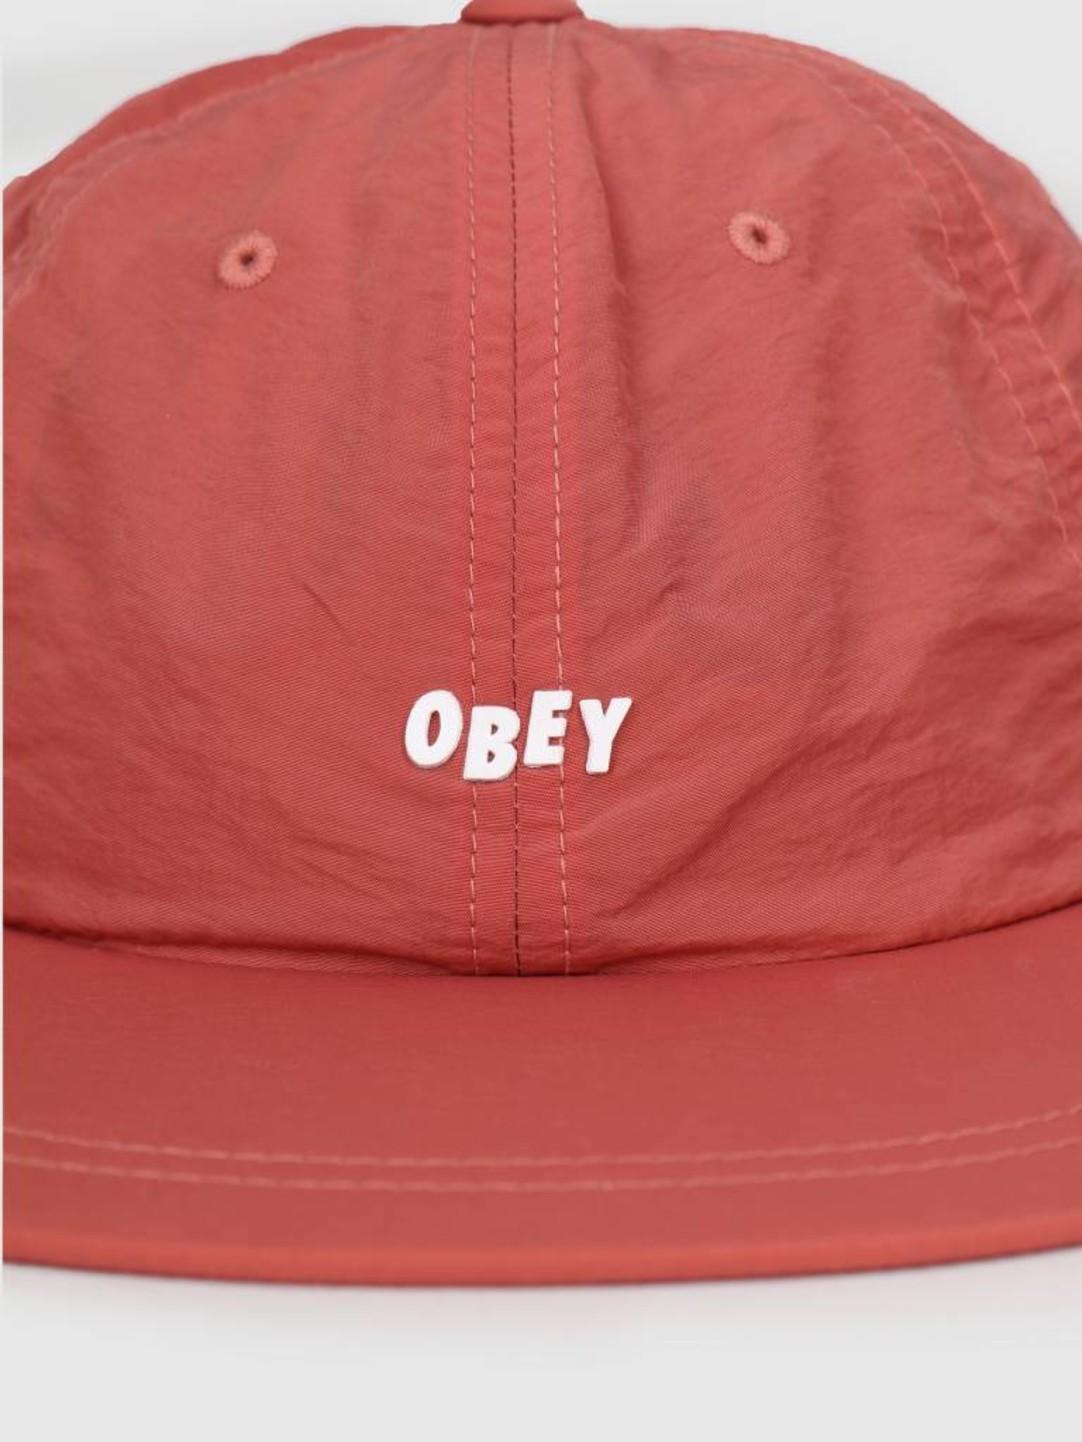 Obey Obey Lennox 6 Panel Strapback EME 100580178